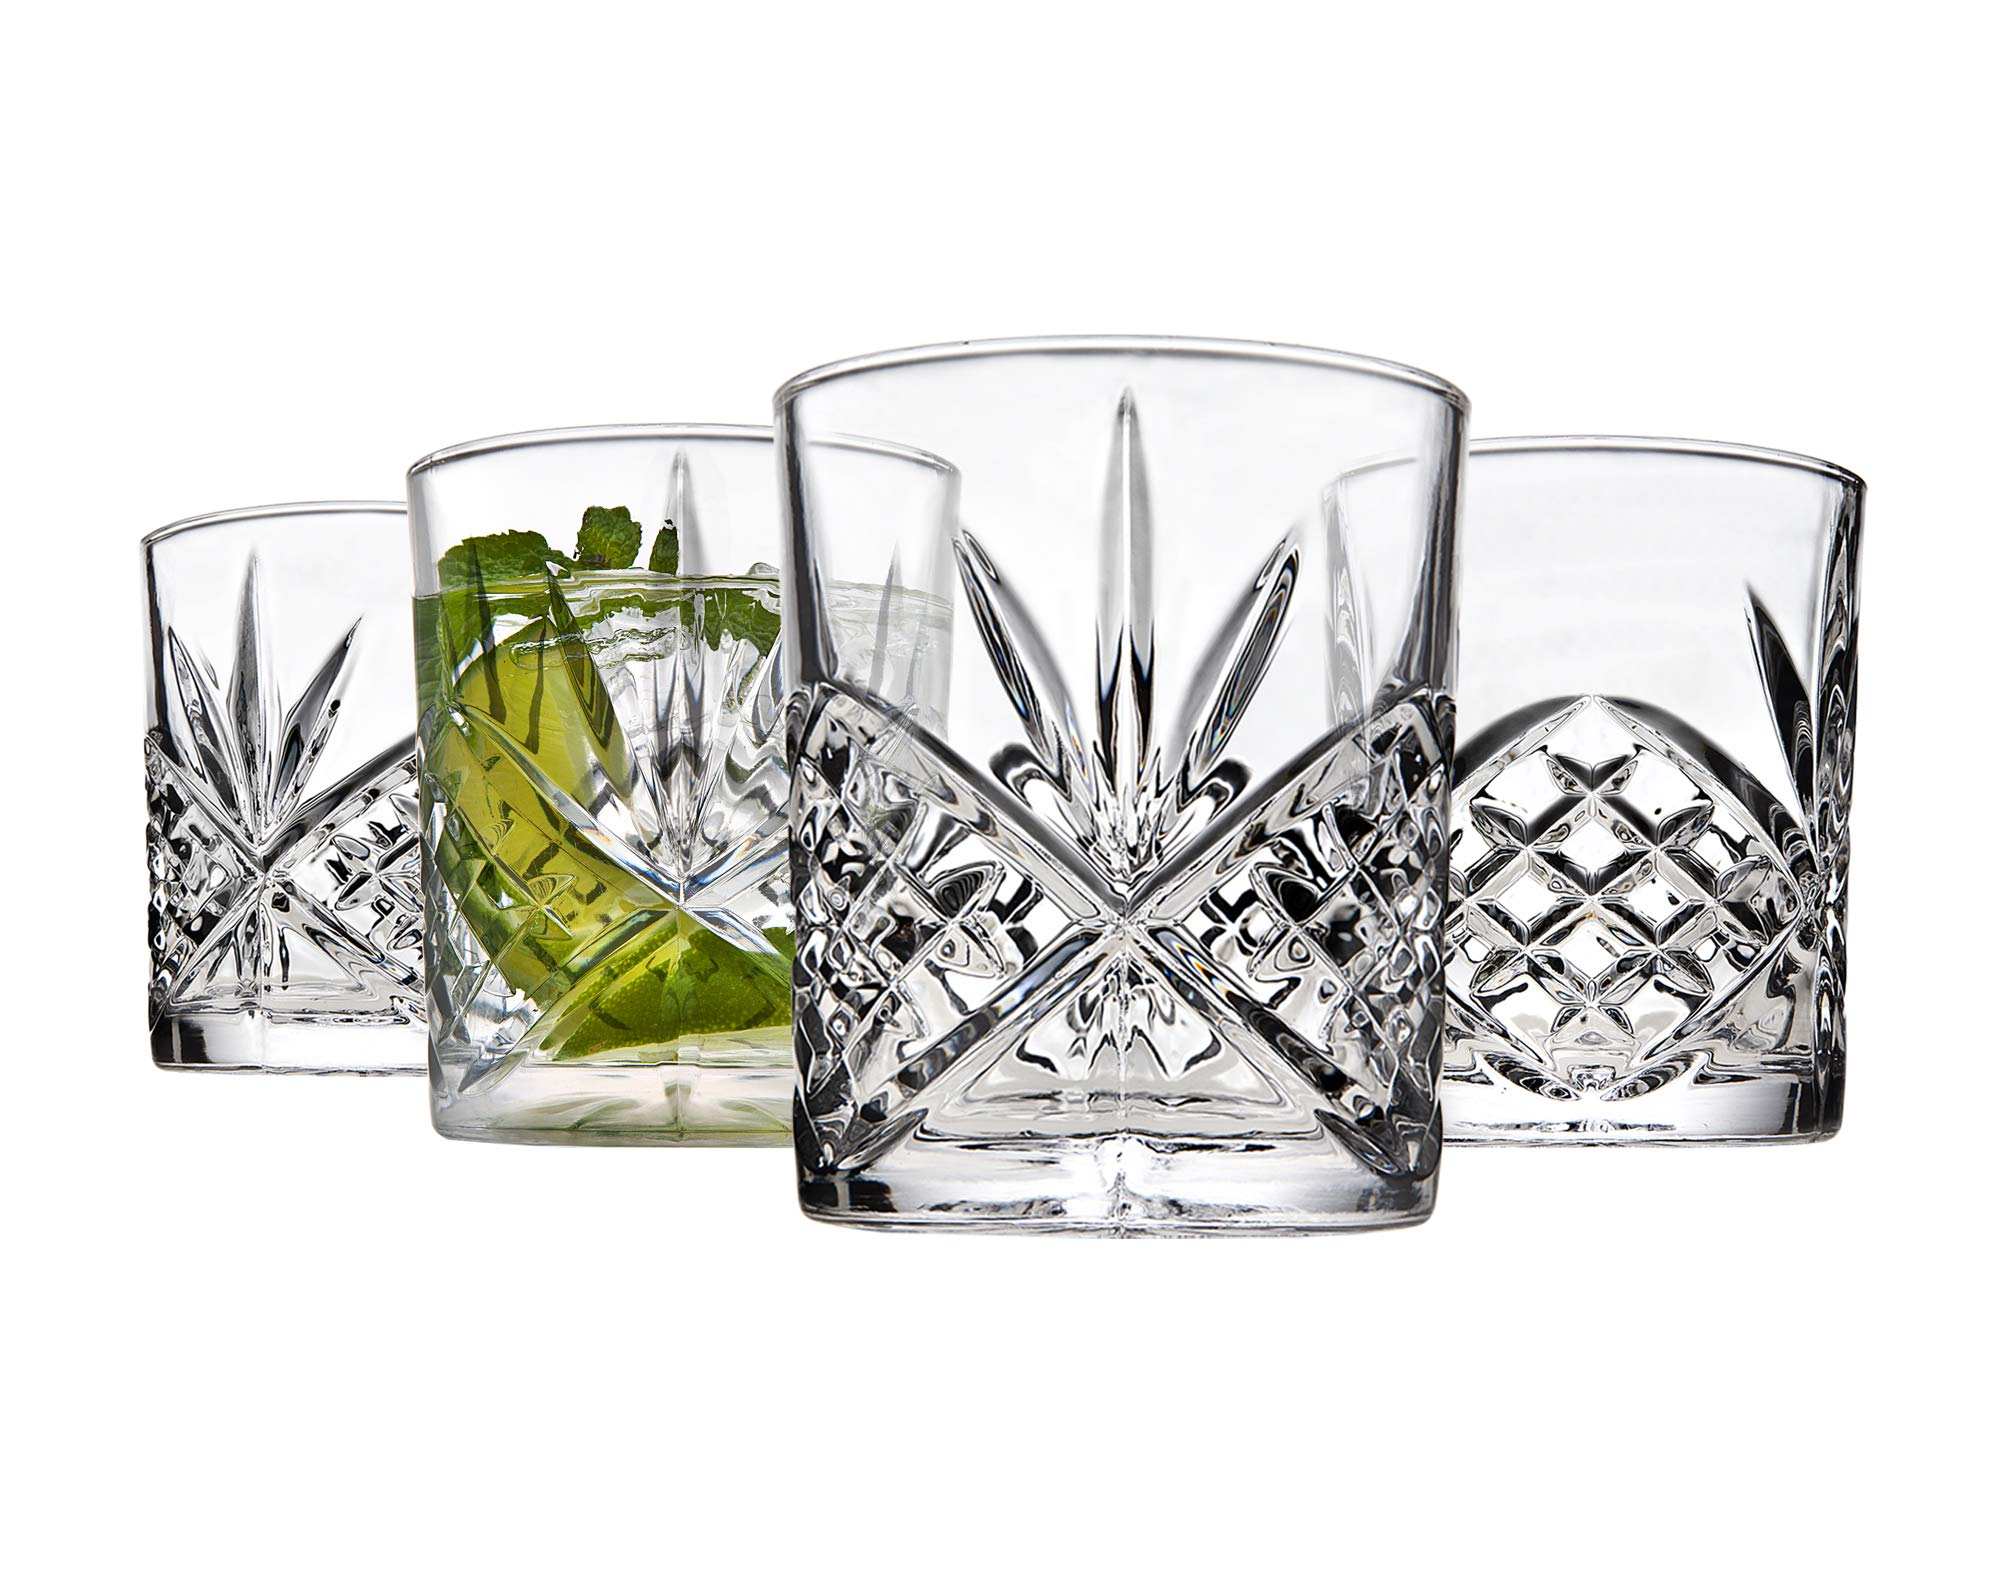 Godinger Fashioned Whiskey Shatterproof Reusable